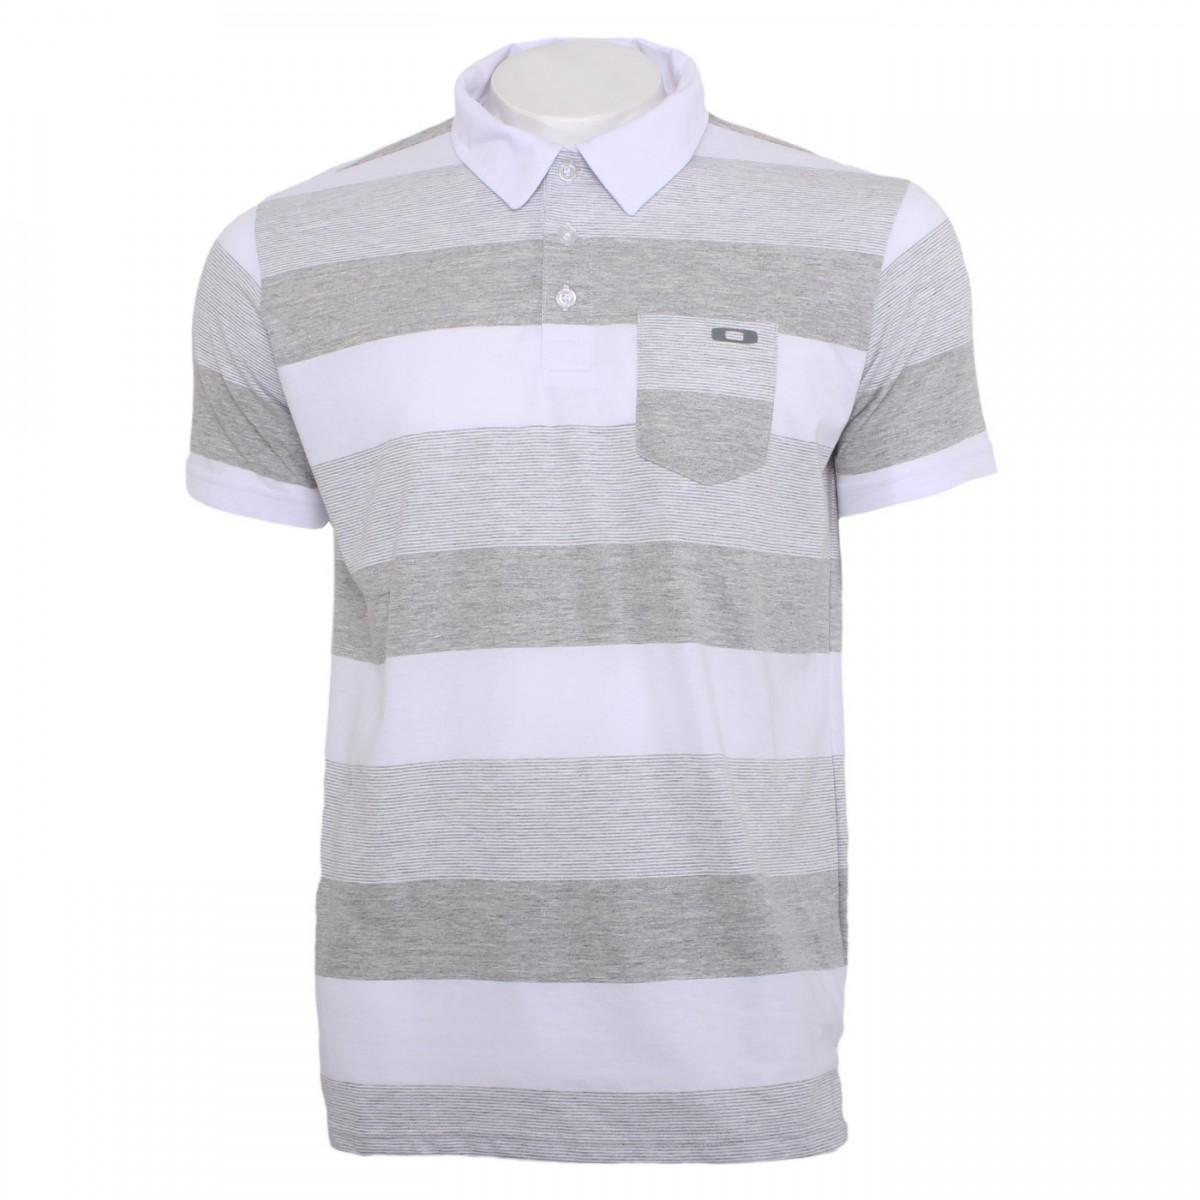 0b3715a138 Camisa Polo Oakley Fusion